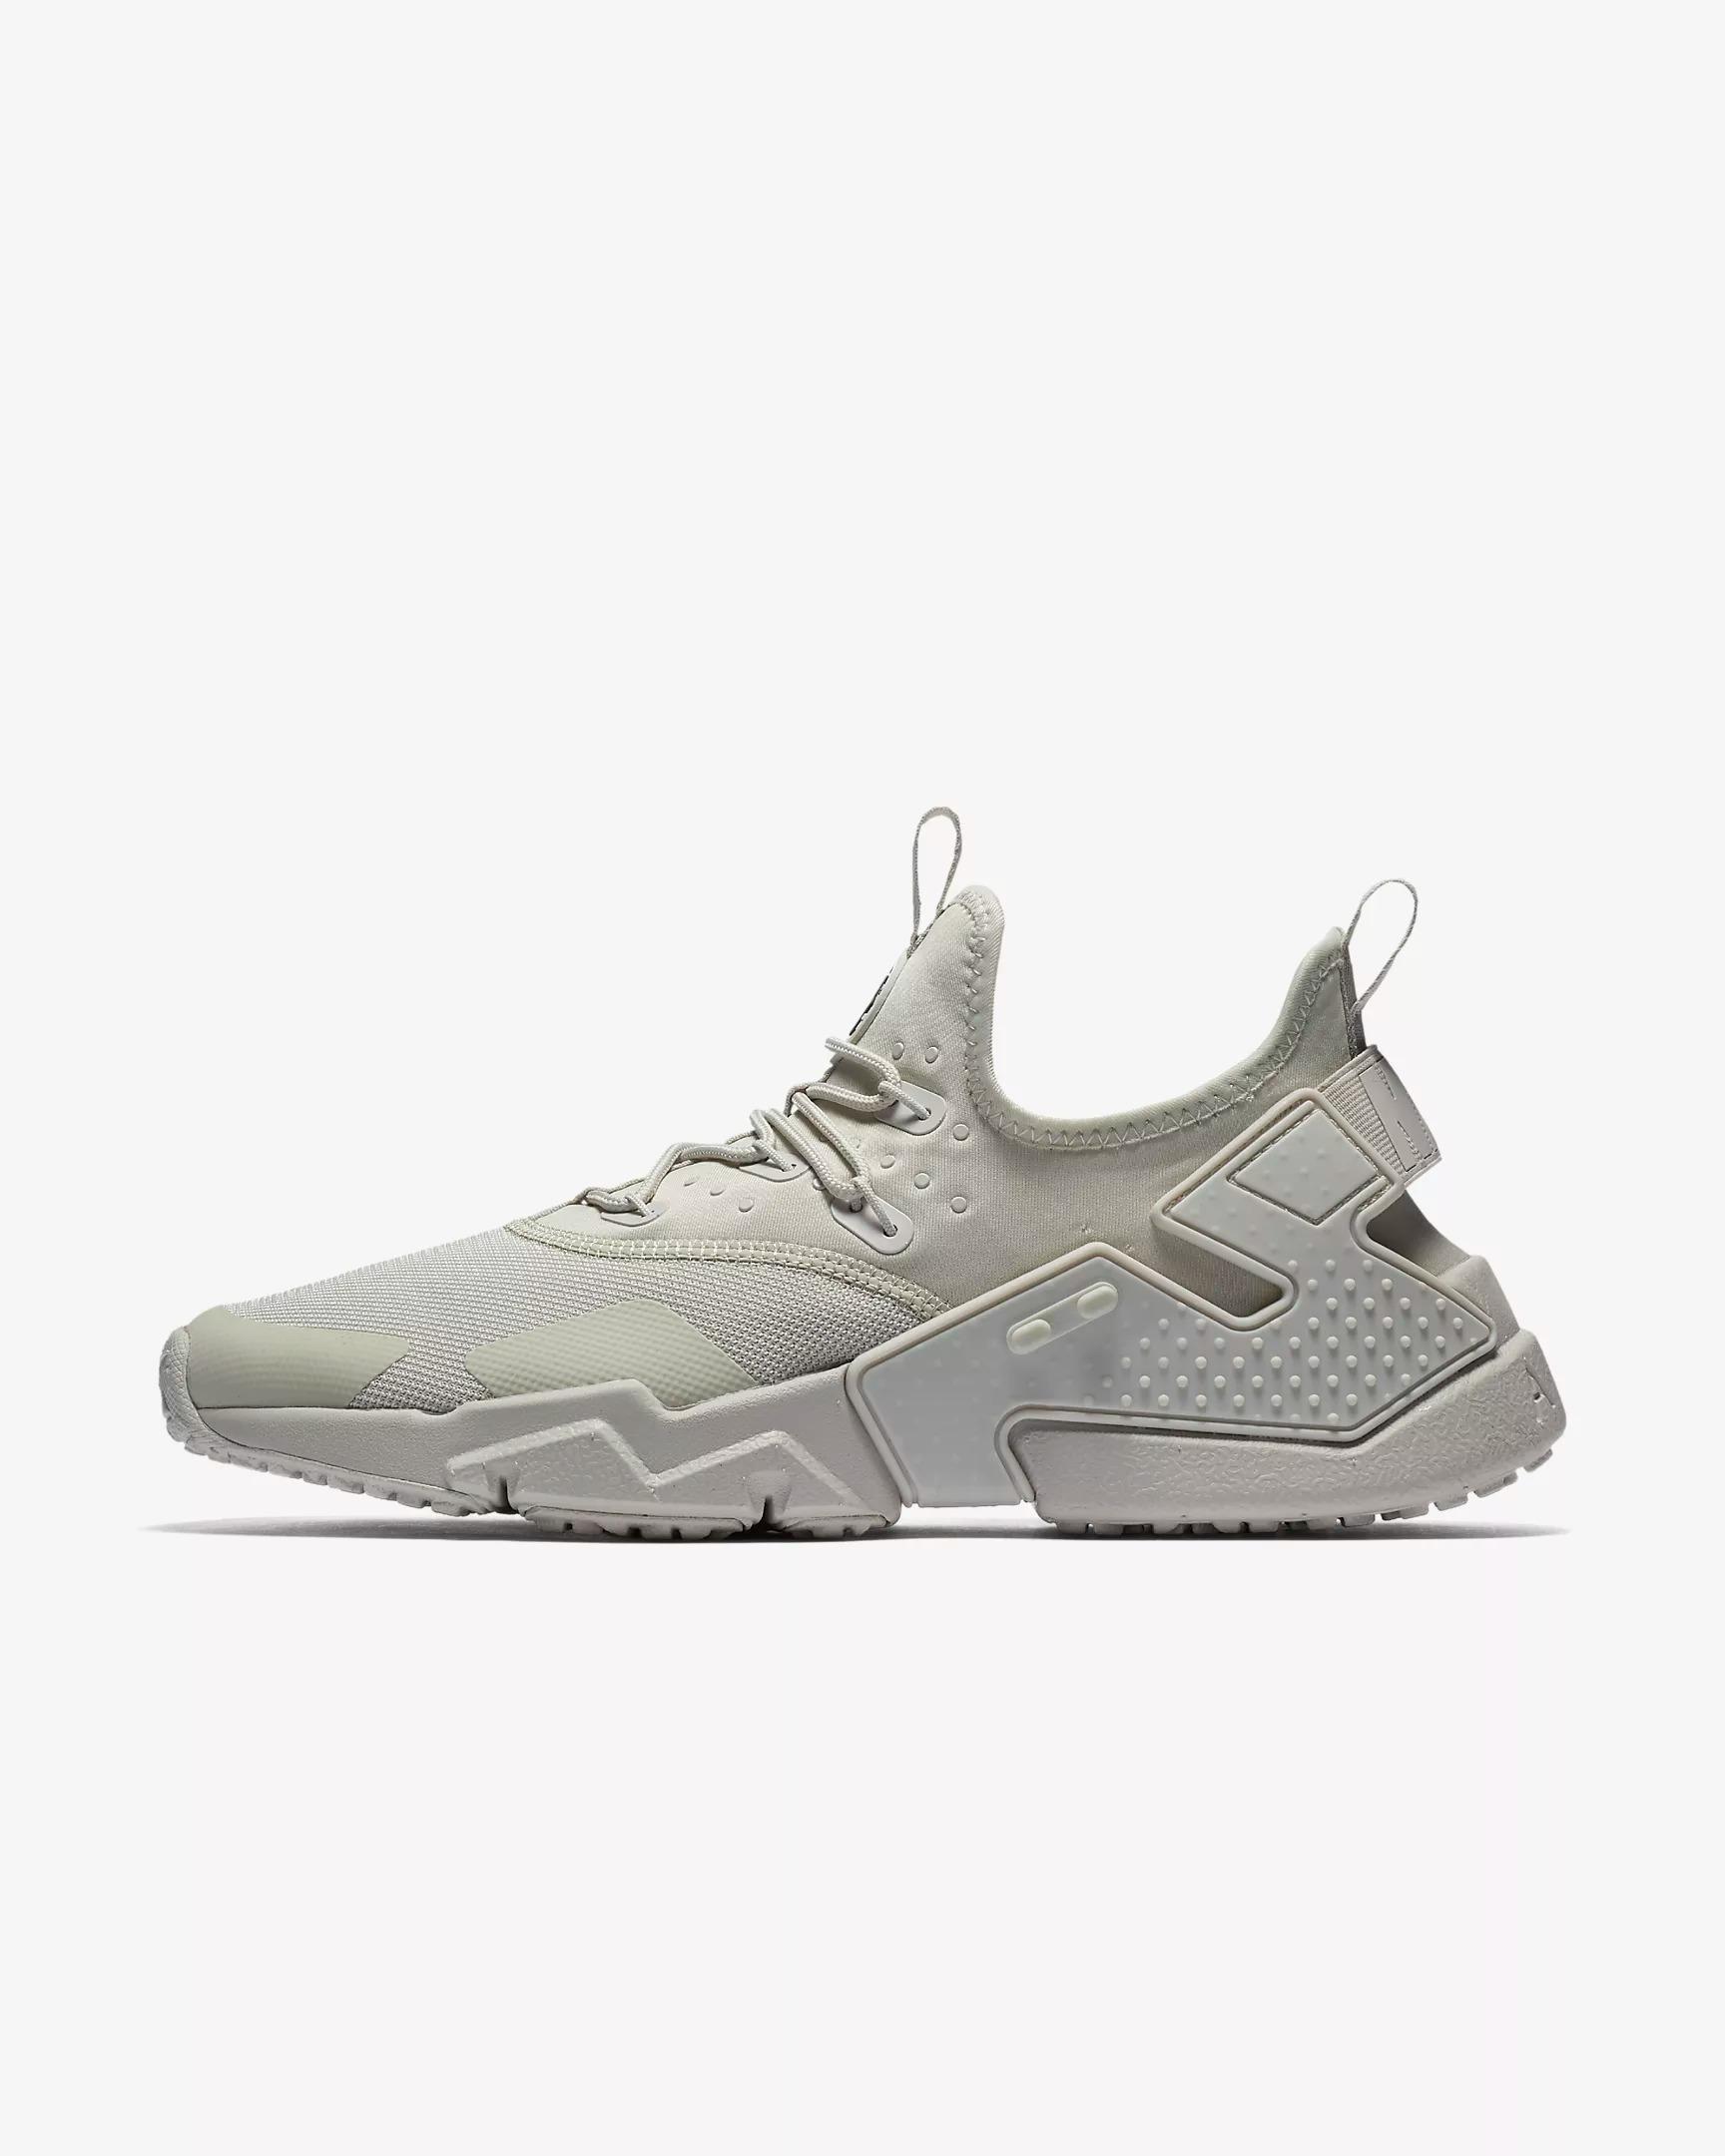 6a17fc0ae1f4 Nike Air Huarache Drift Sneakers Last Size 40 - SPORT SHOES ...